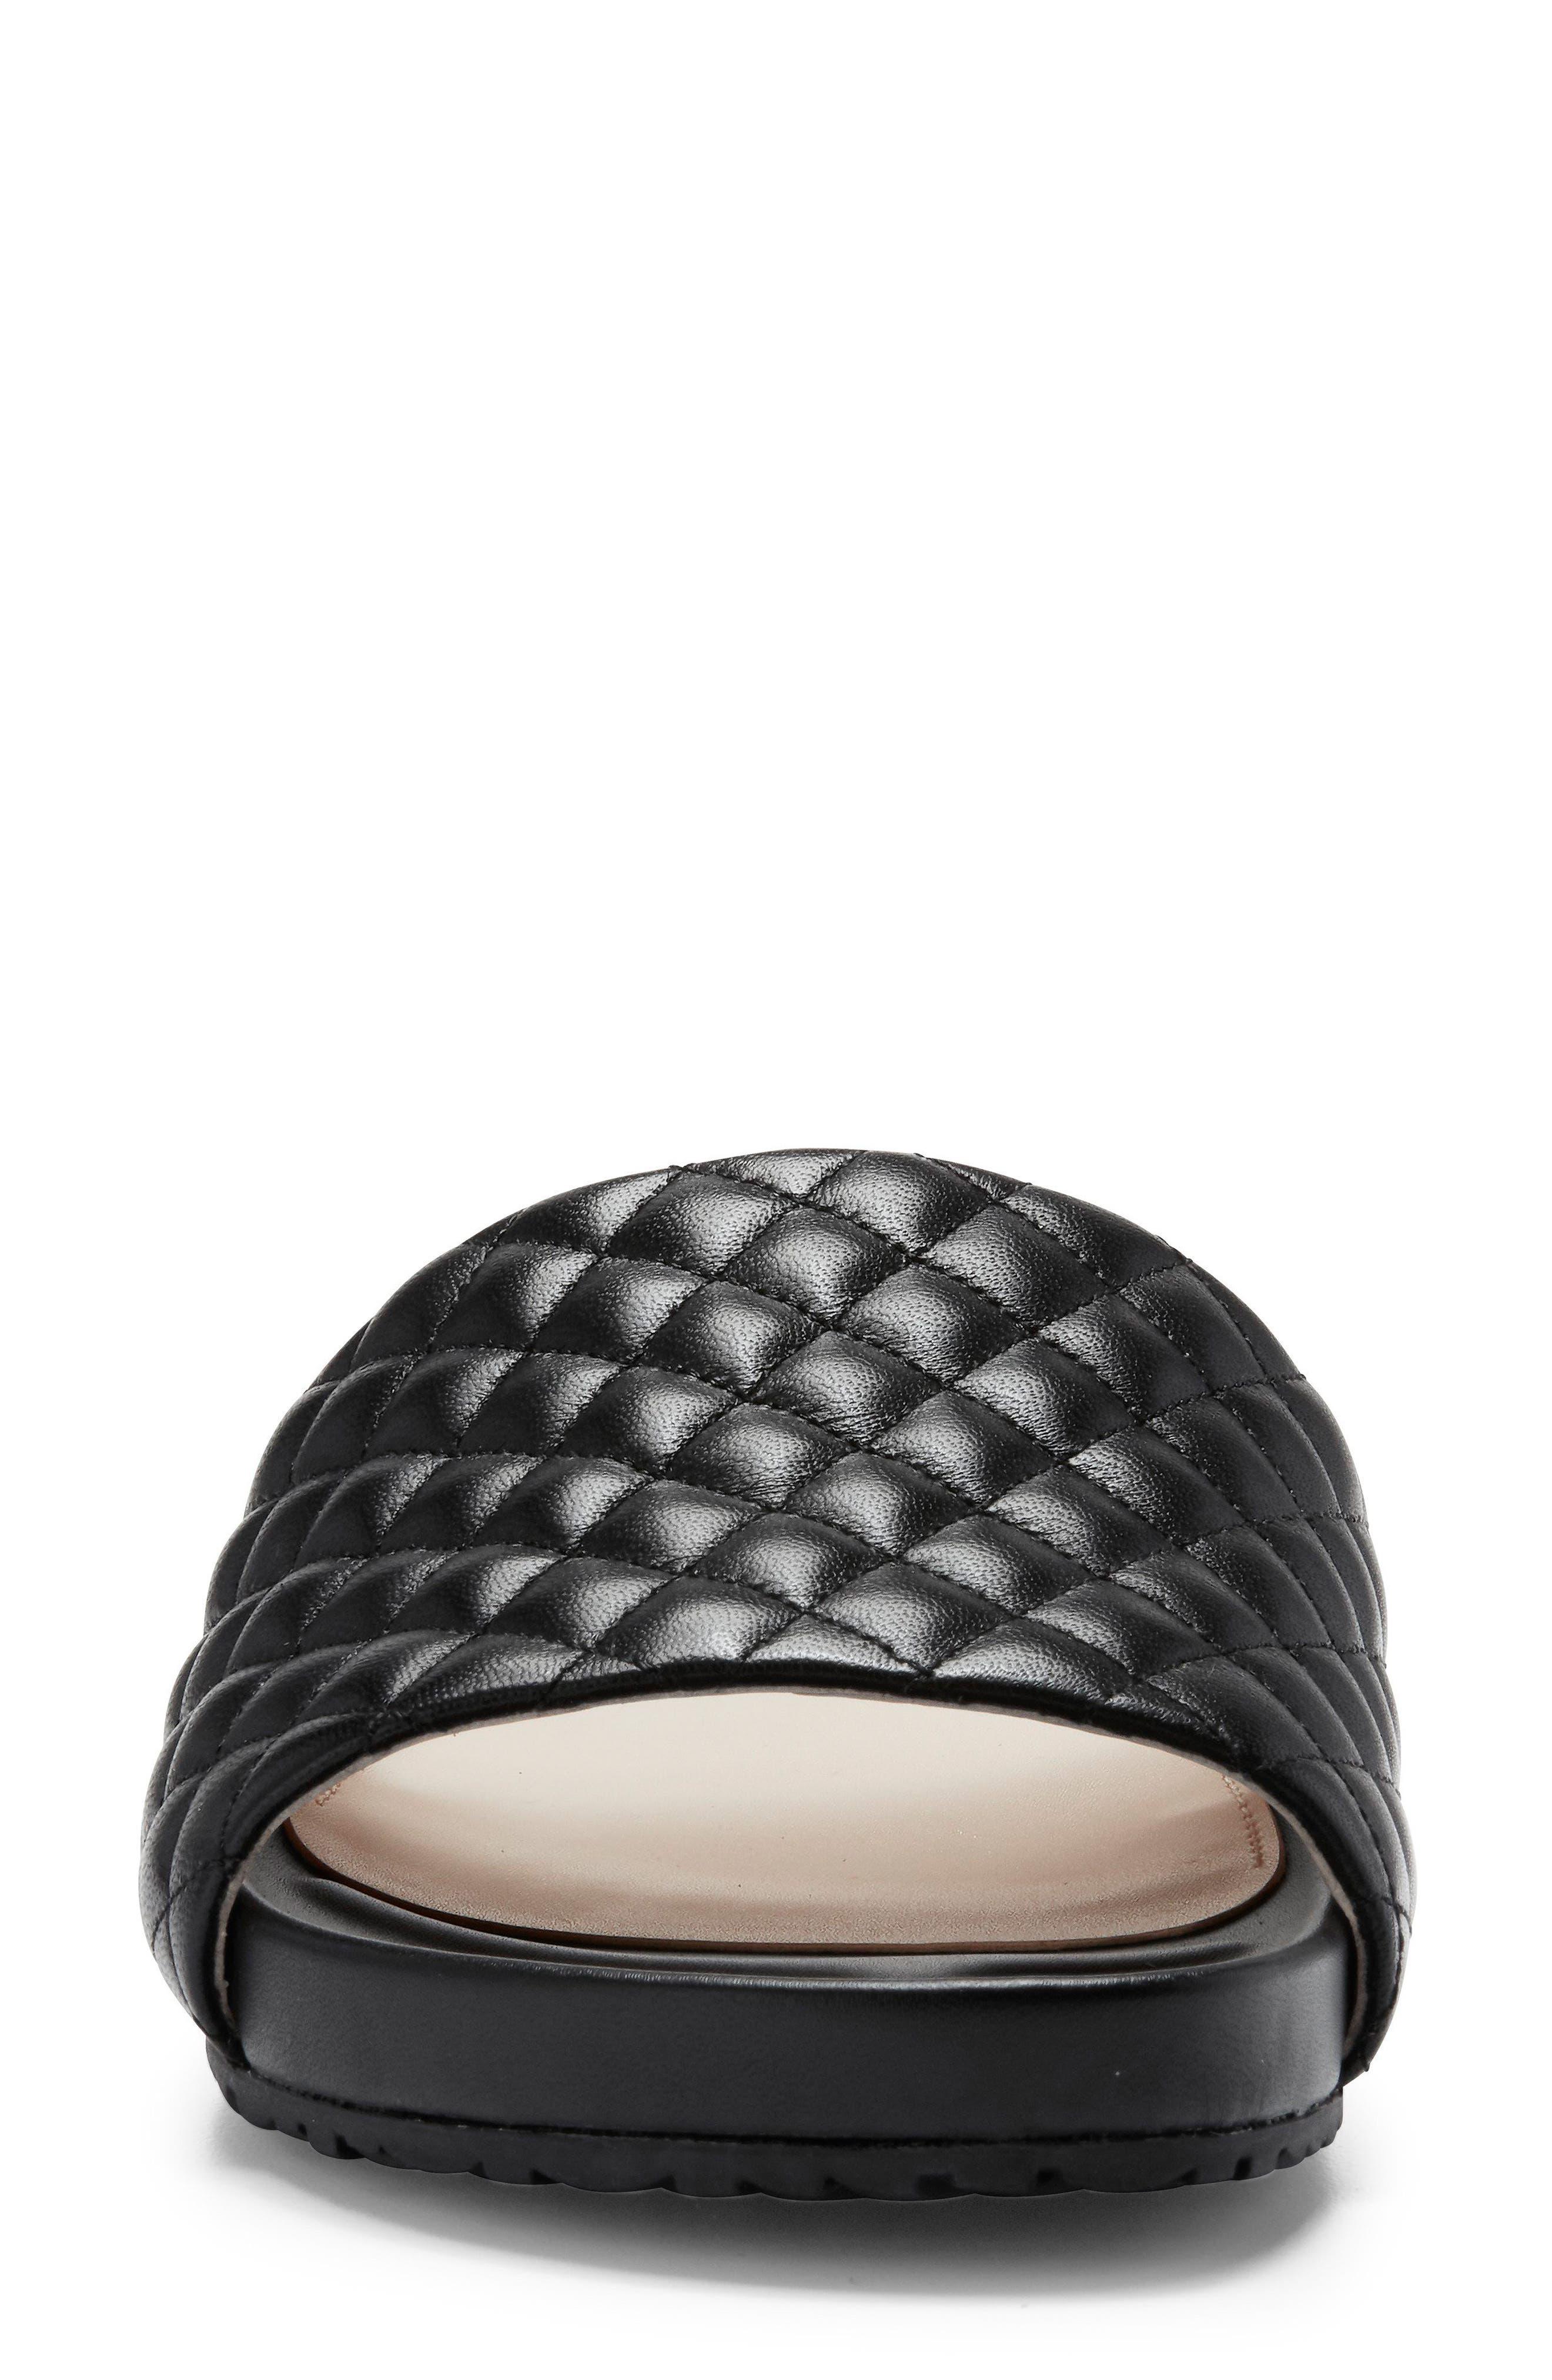 Pinch Montauk Slide Sandal,                             Alternate thumbnail 4, color,                             Black Quilted Leather